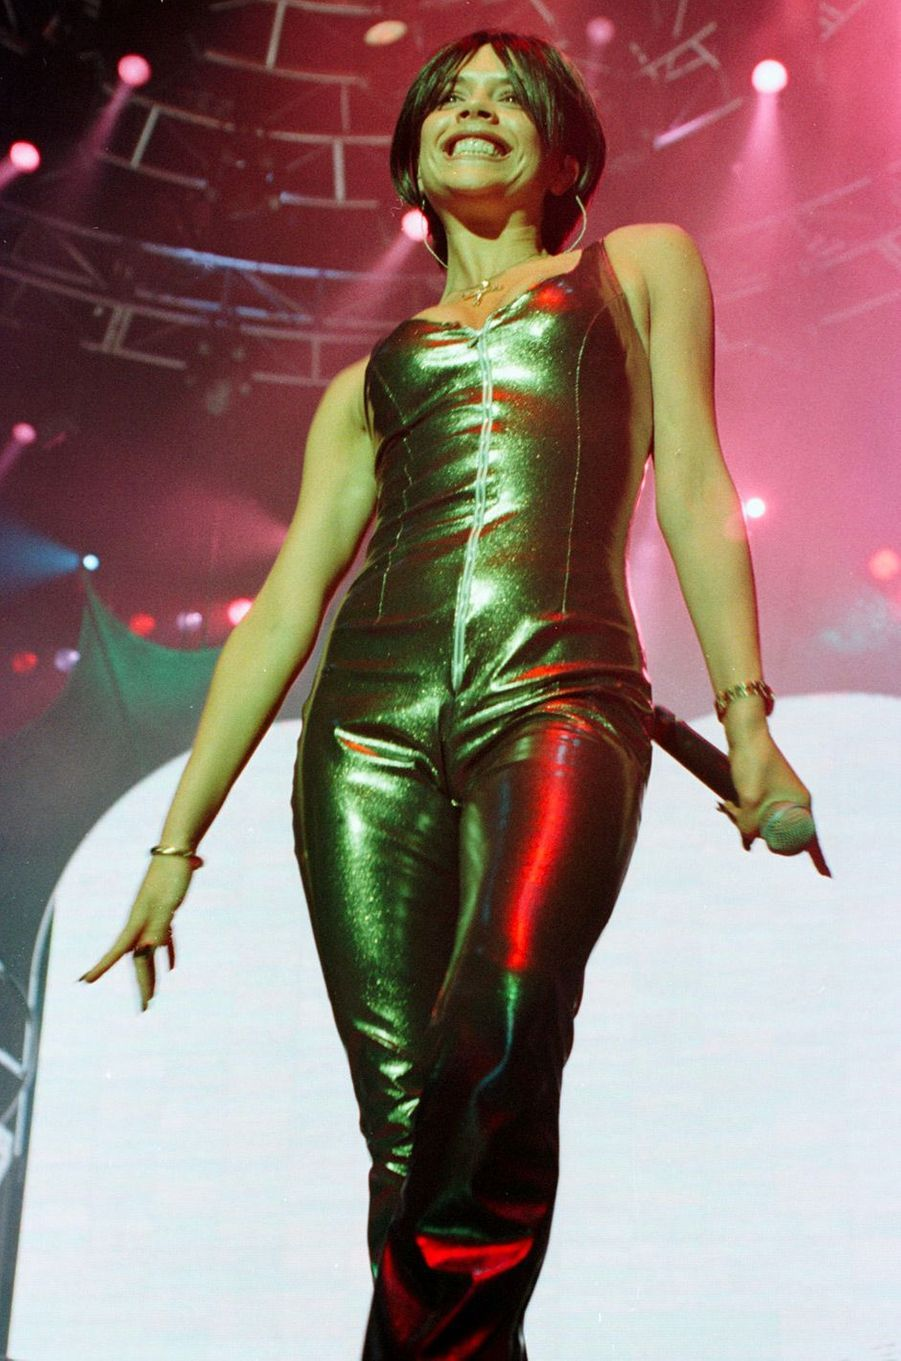 Victoria Beckham, aka Posh Spice, le 24 février 1998